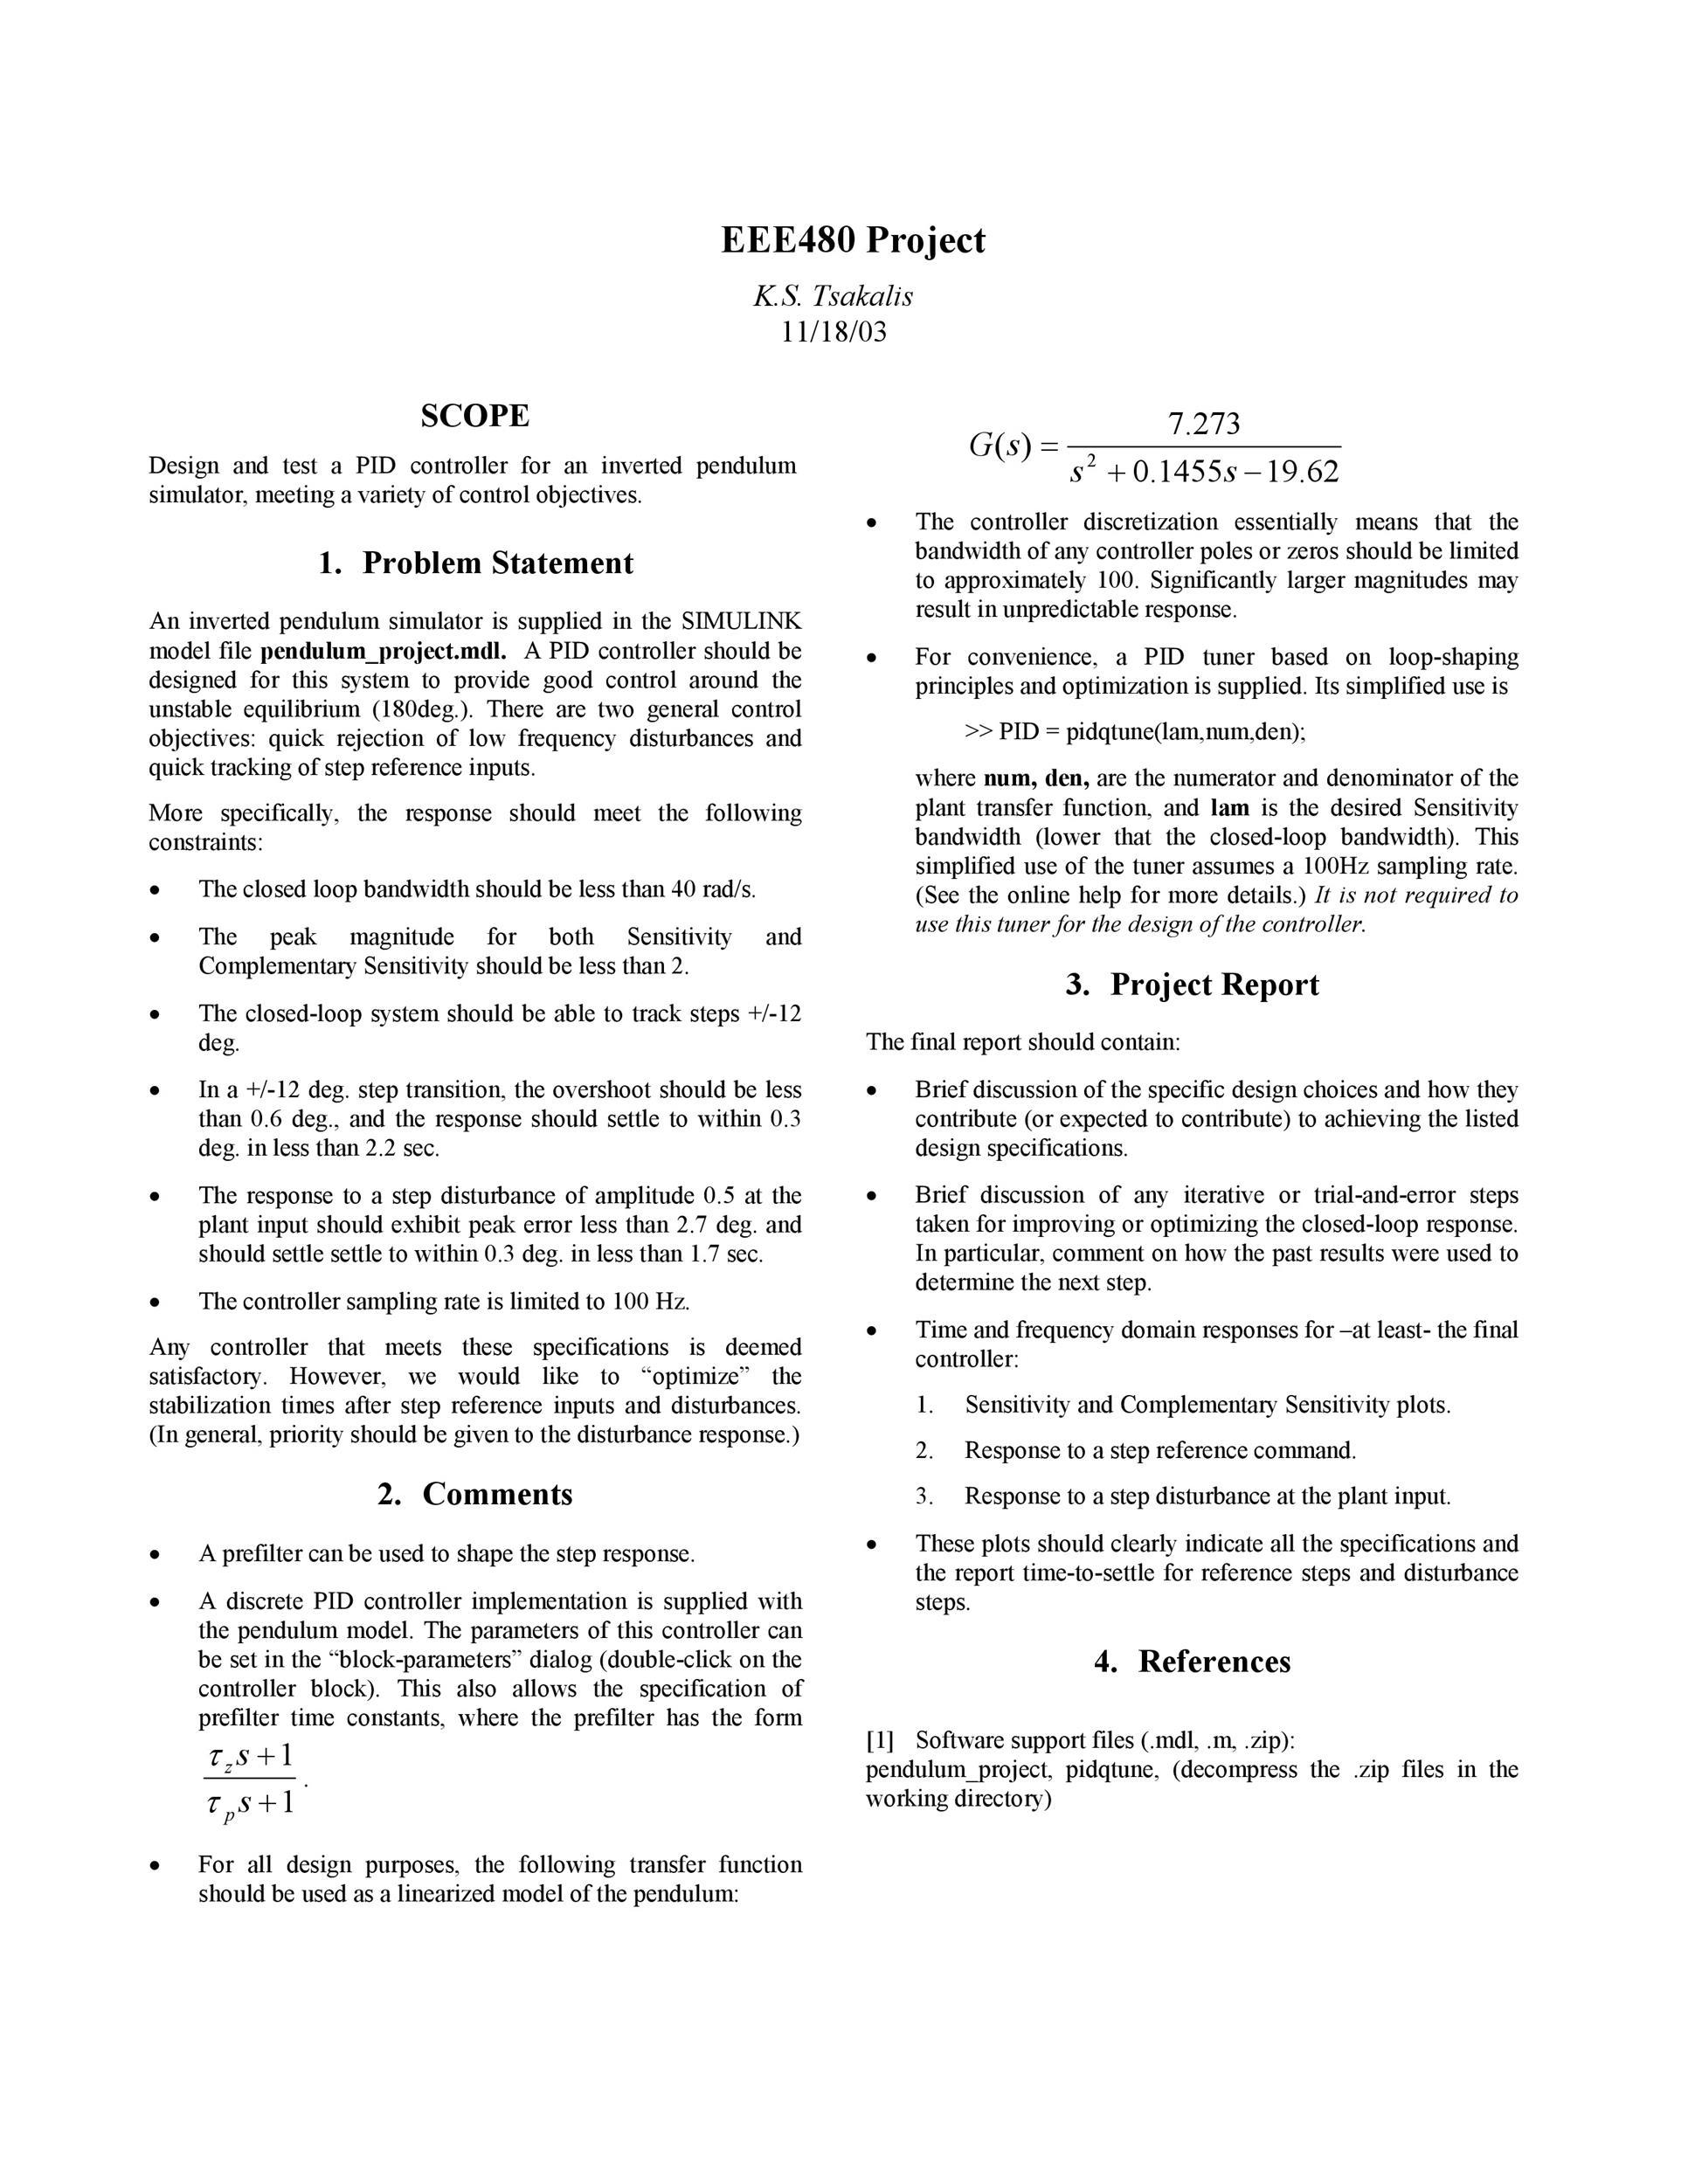 Free Problem Statement Template 49